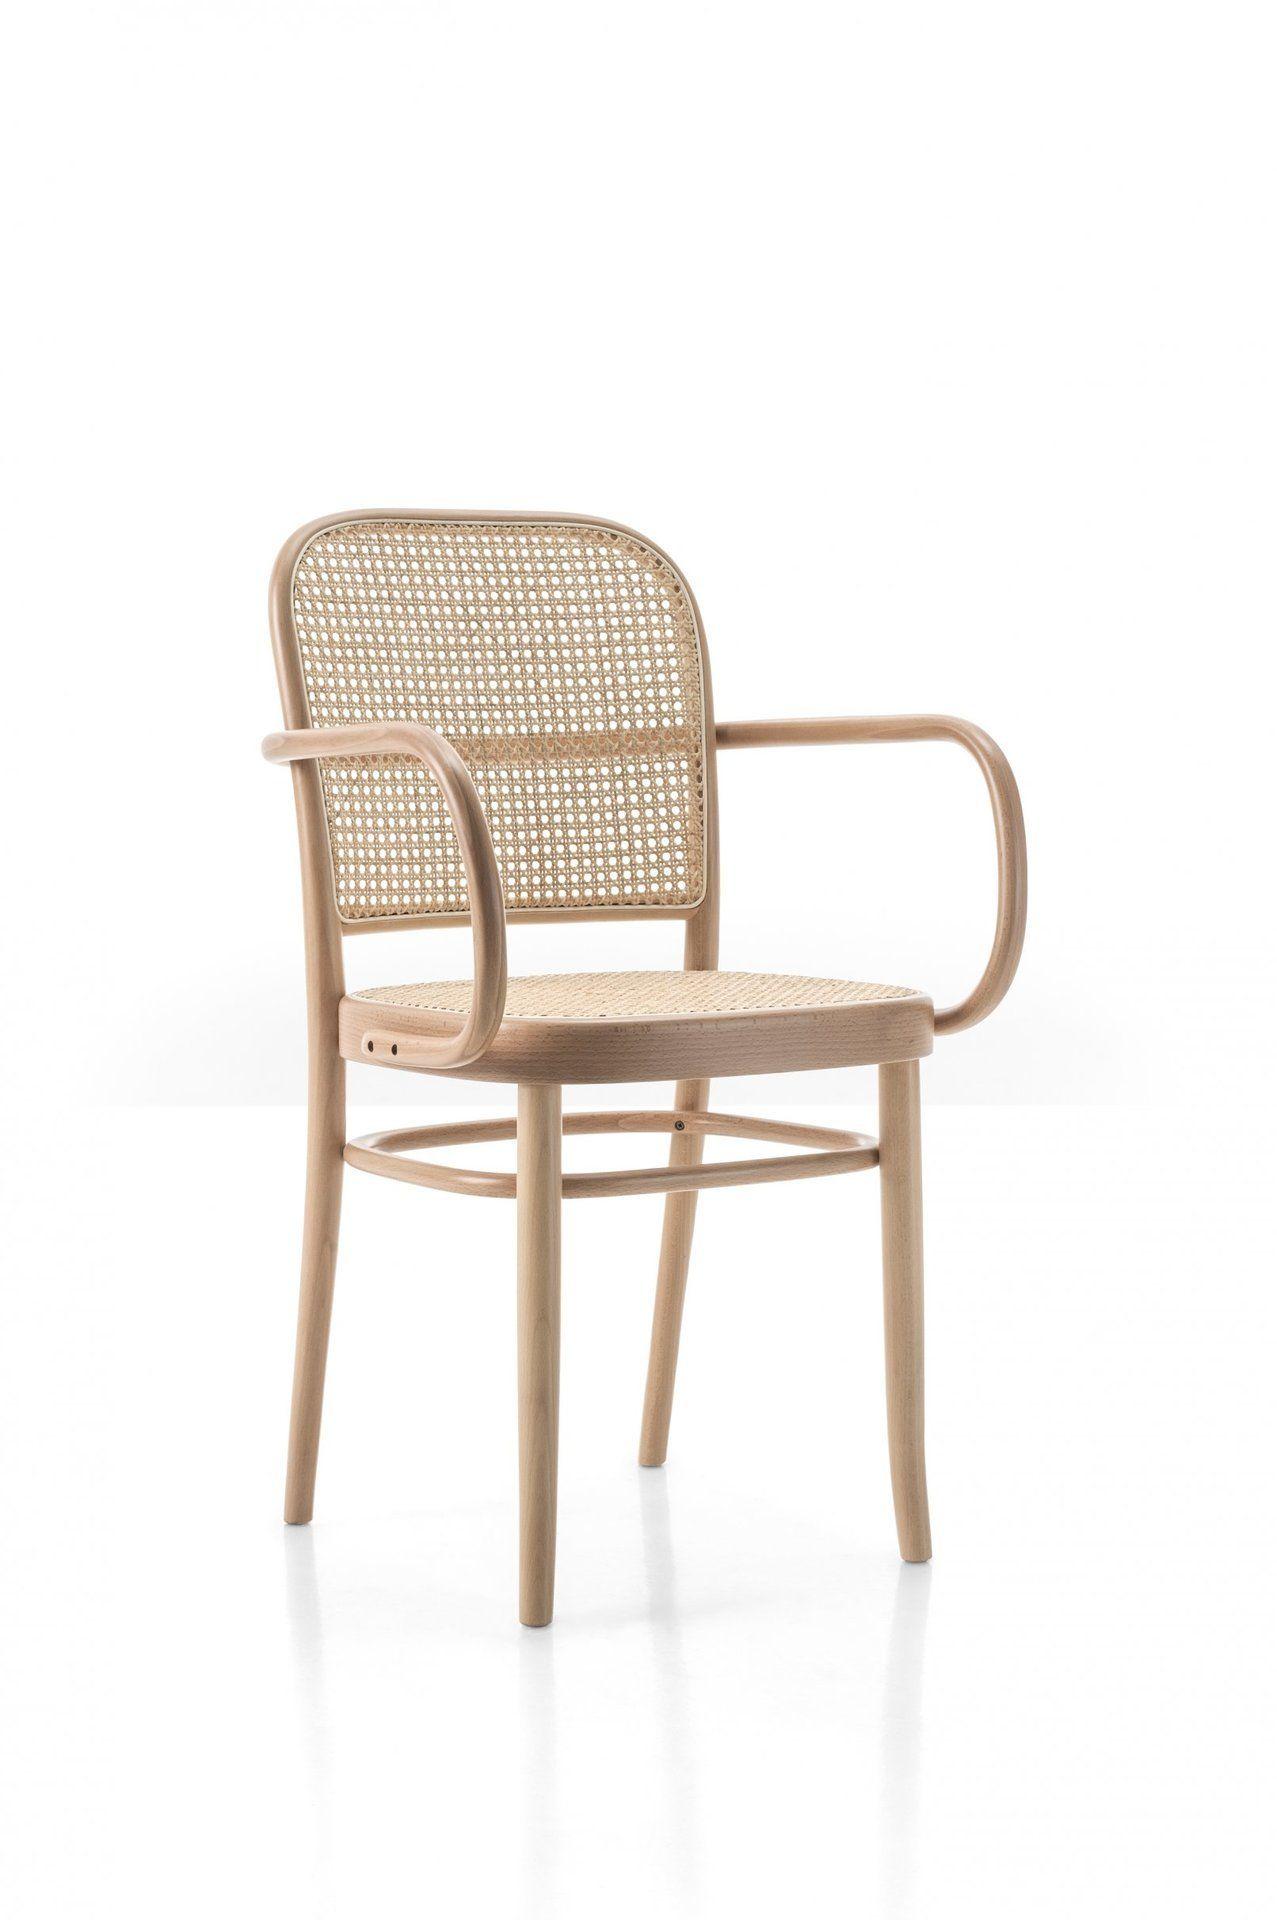 N 811 Bugholzstuhle Thonet Stuhle Stuhl Design